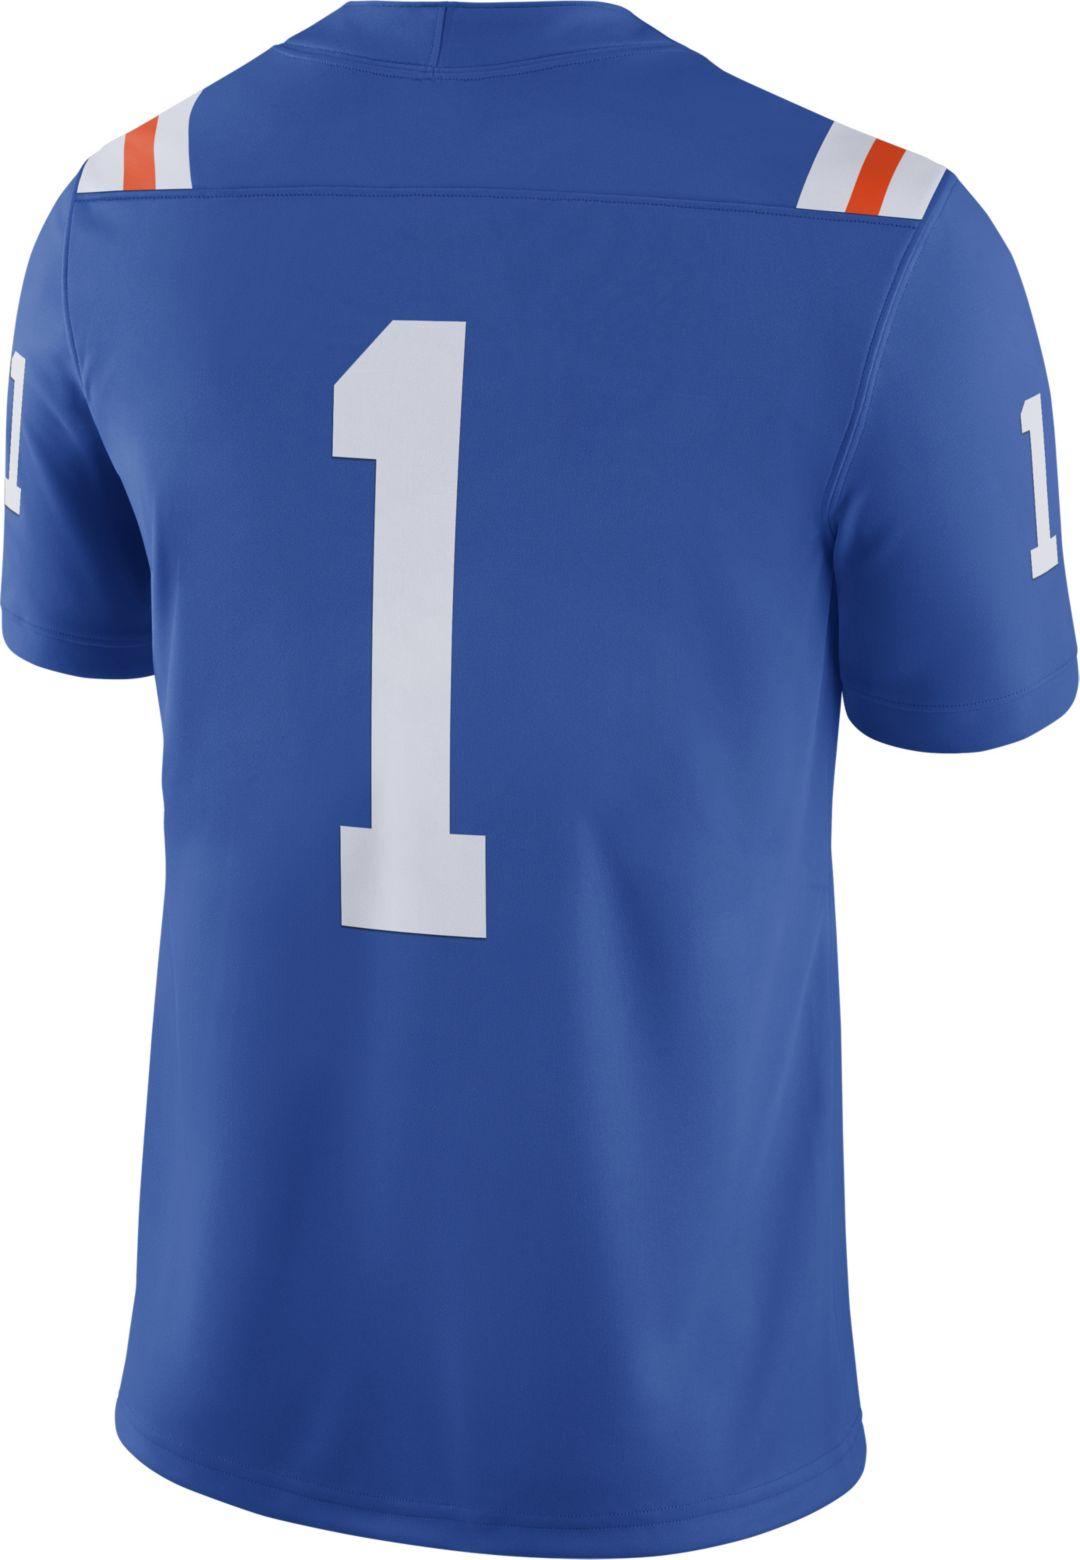 quality design 0b9fc 1606d Jordan Men's Florida Gators #1 Blue Dri-FIT Game Football Jersey